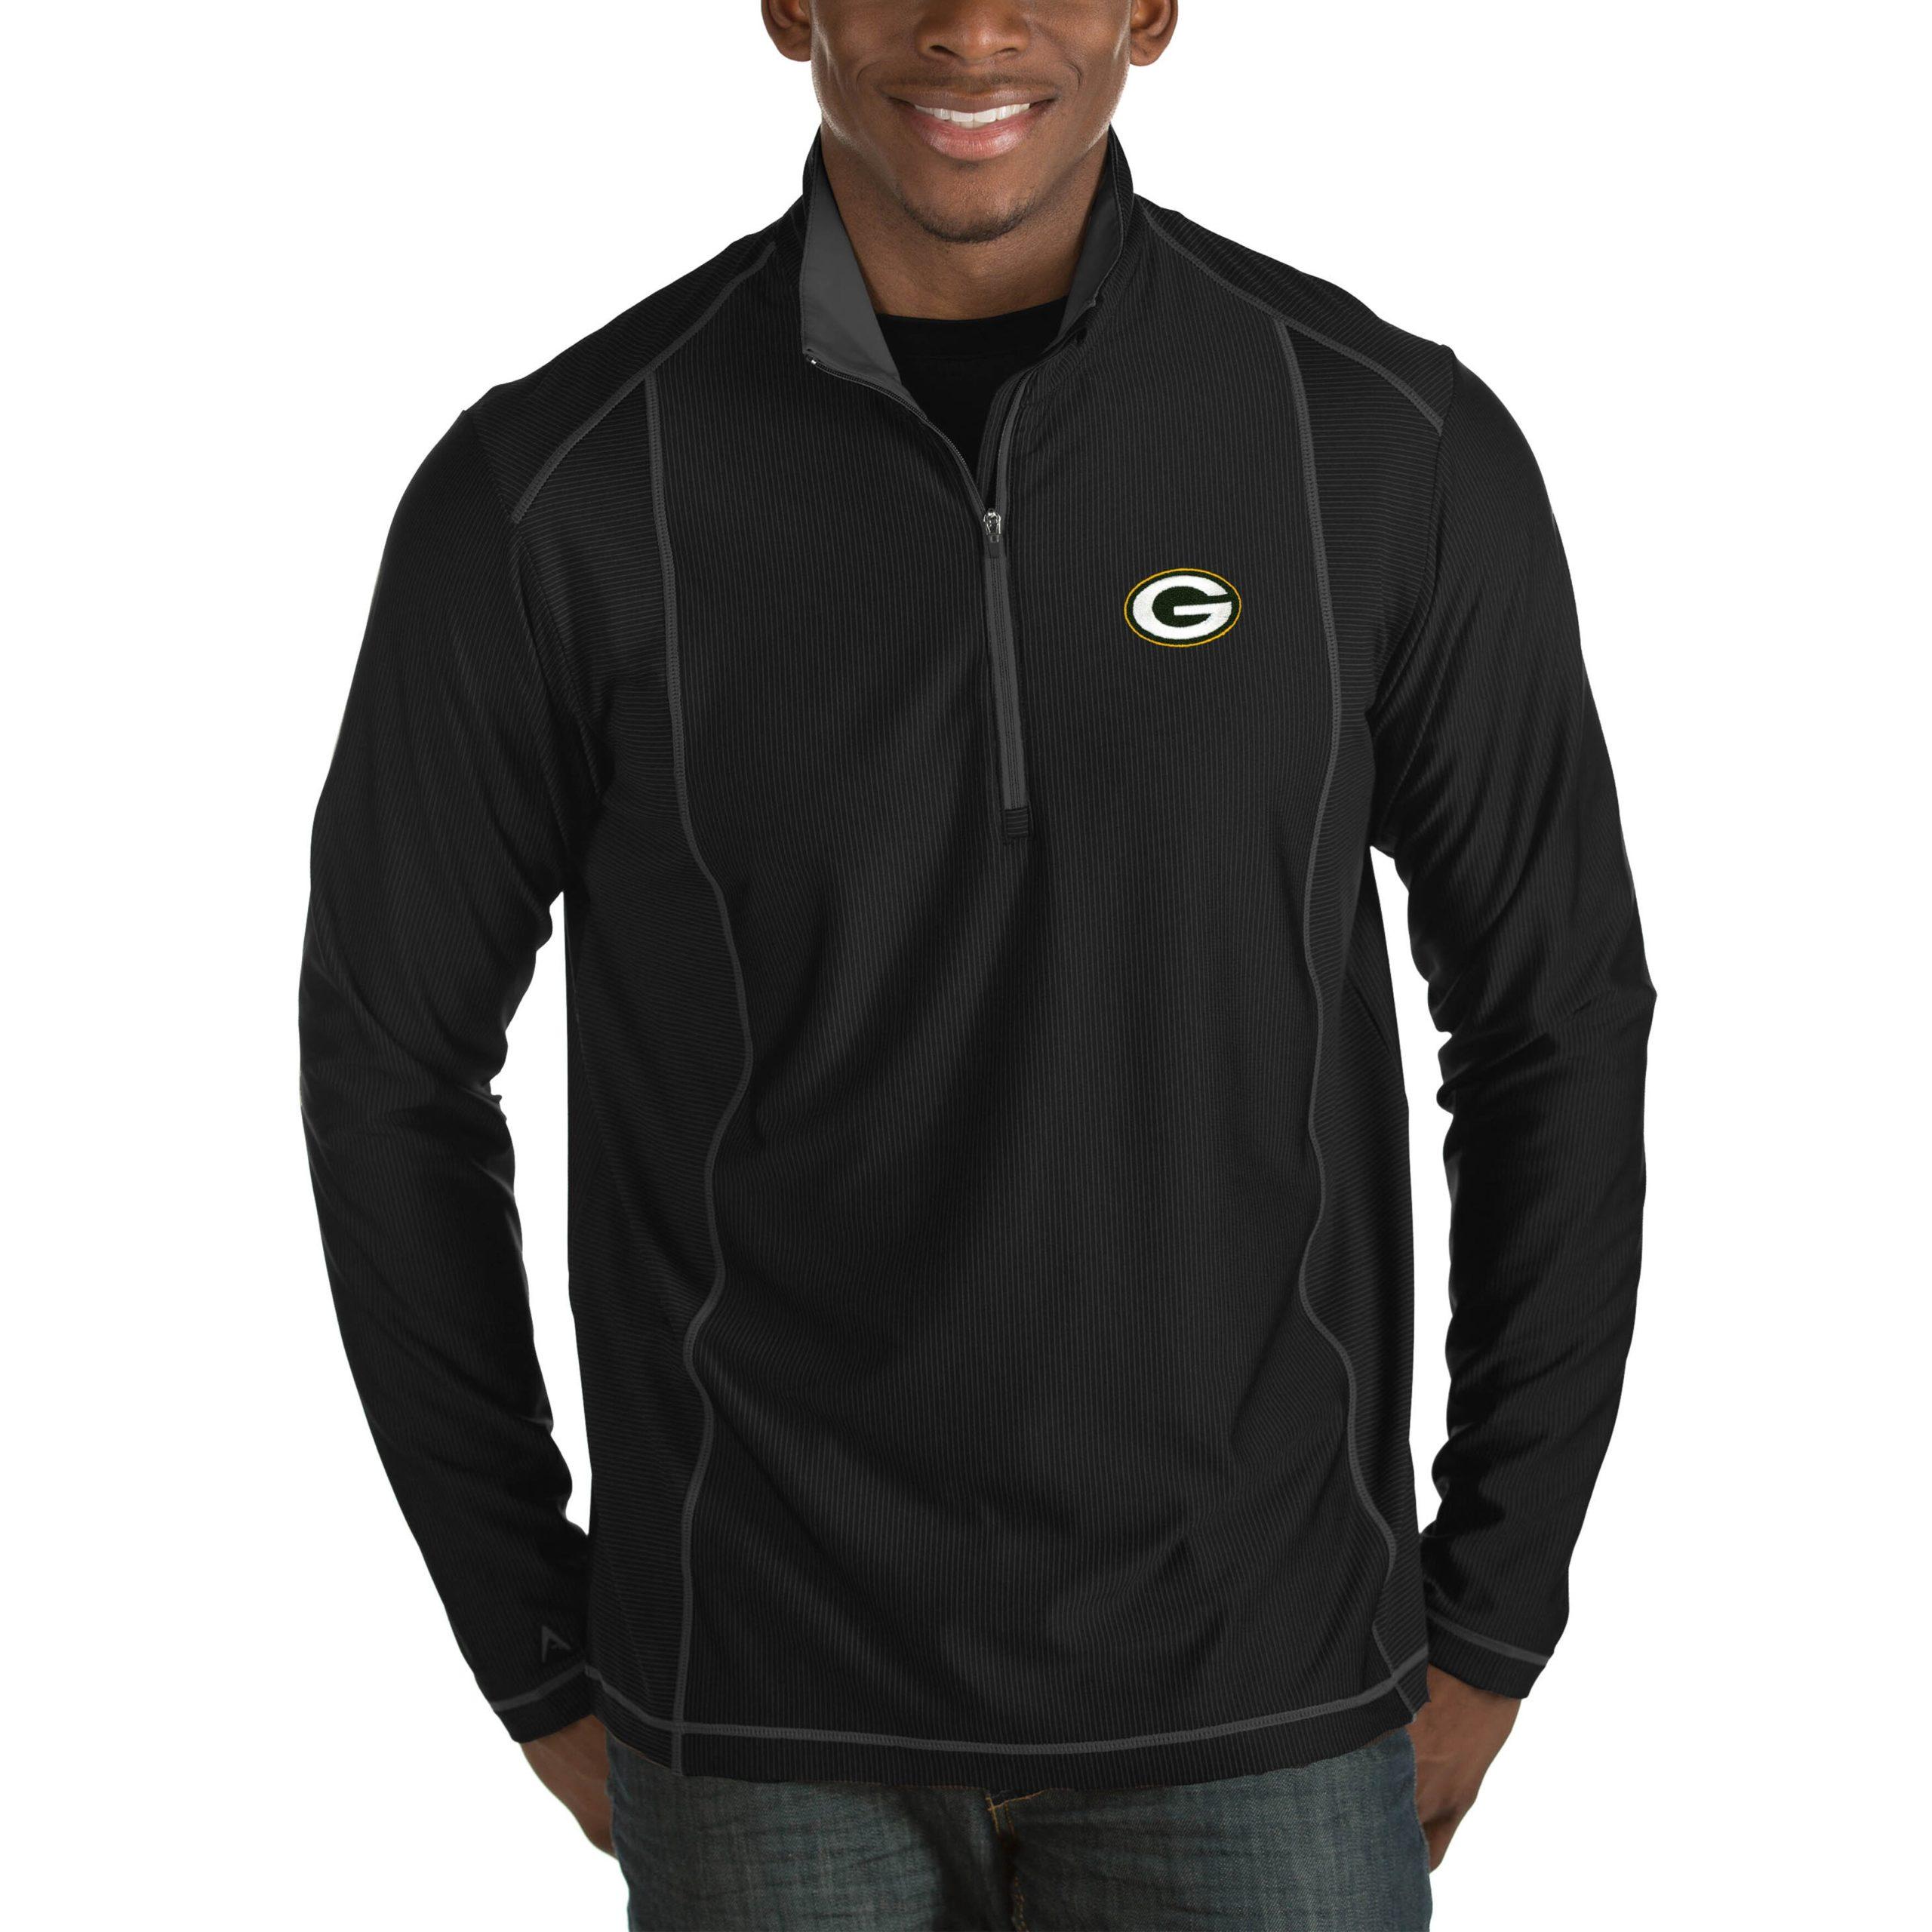 Green Bay Packers Antigua Tempo Big & Tall Half-Zip Pullover Jacket - Heather Black